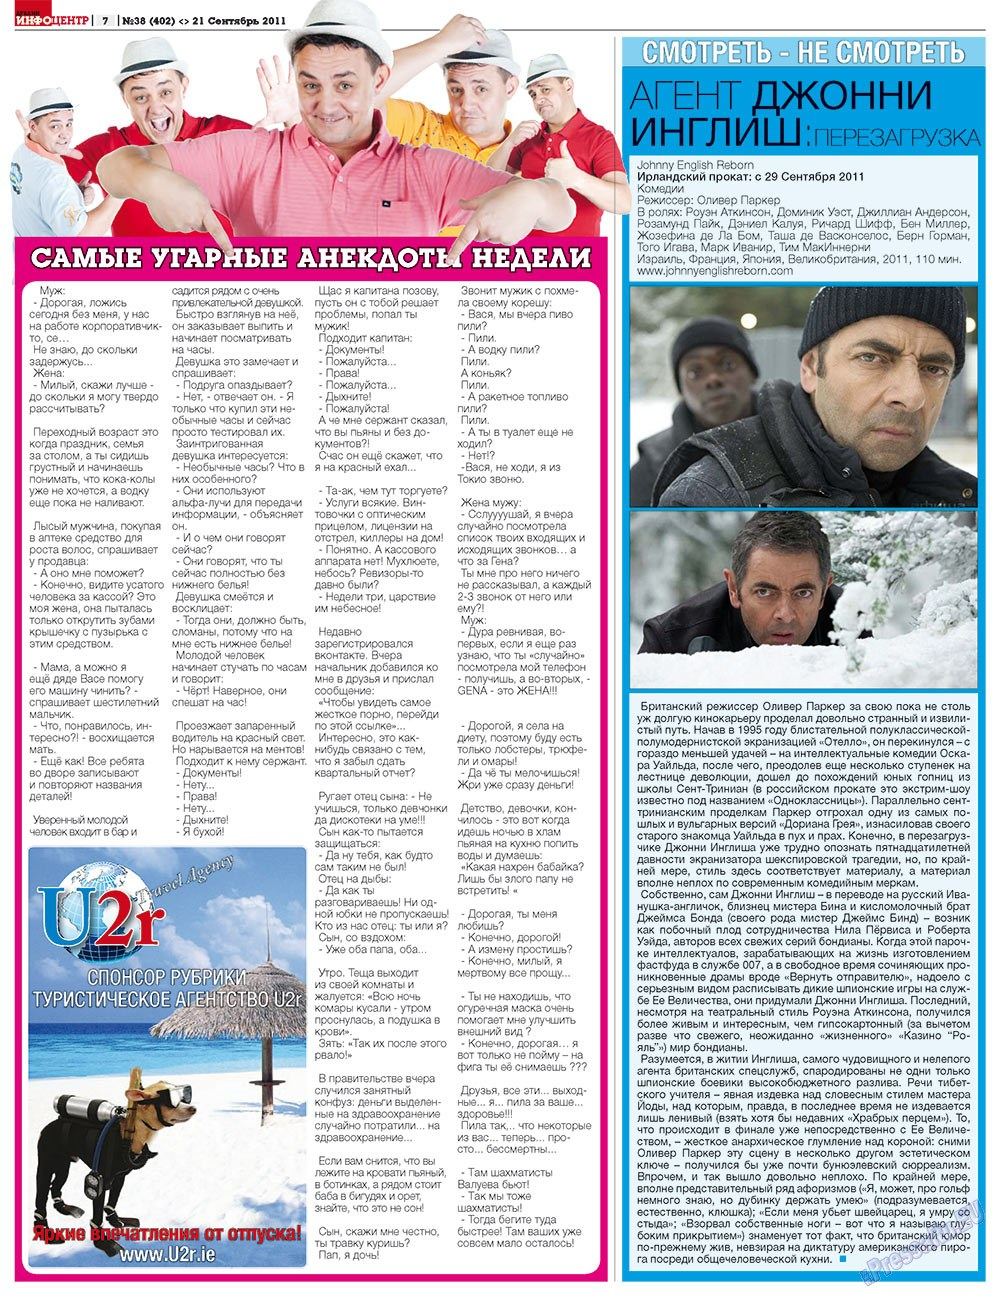 Дублин инфоцентр (газета). 2011 год, номер 38, стр. 7